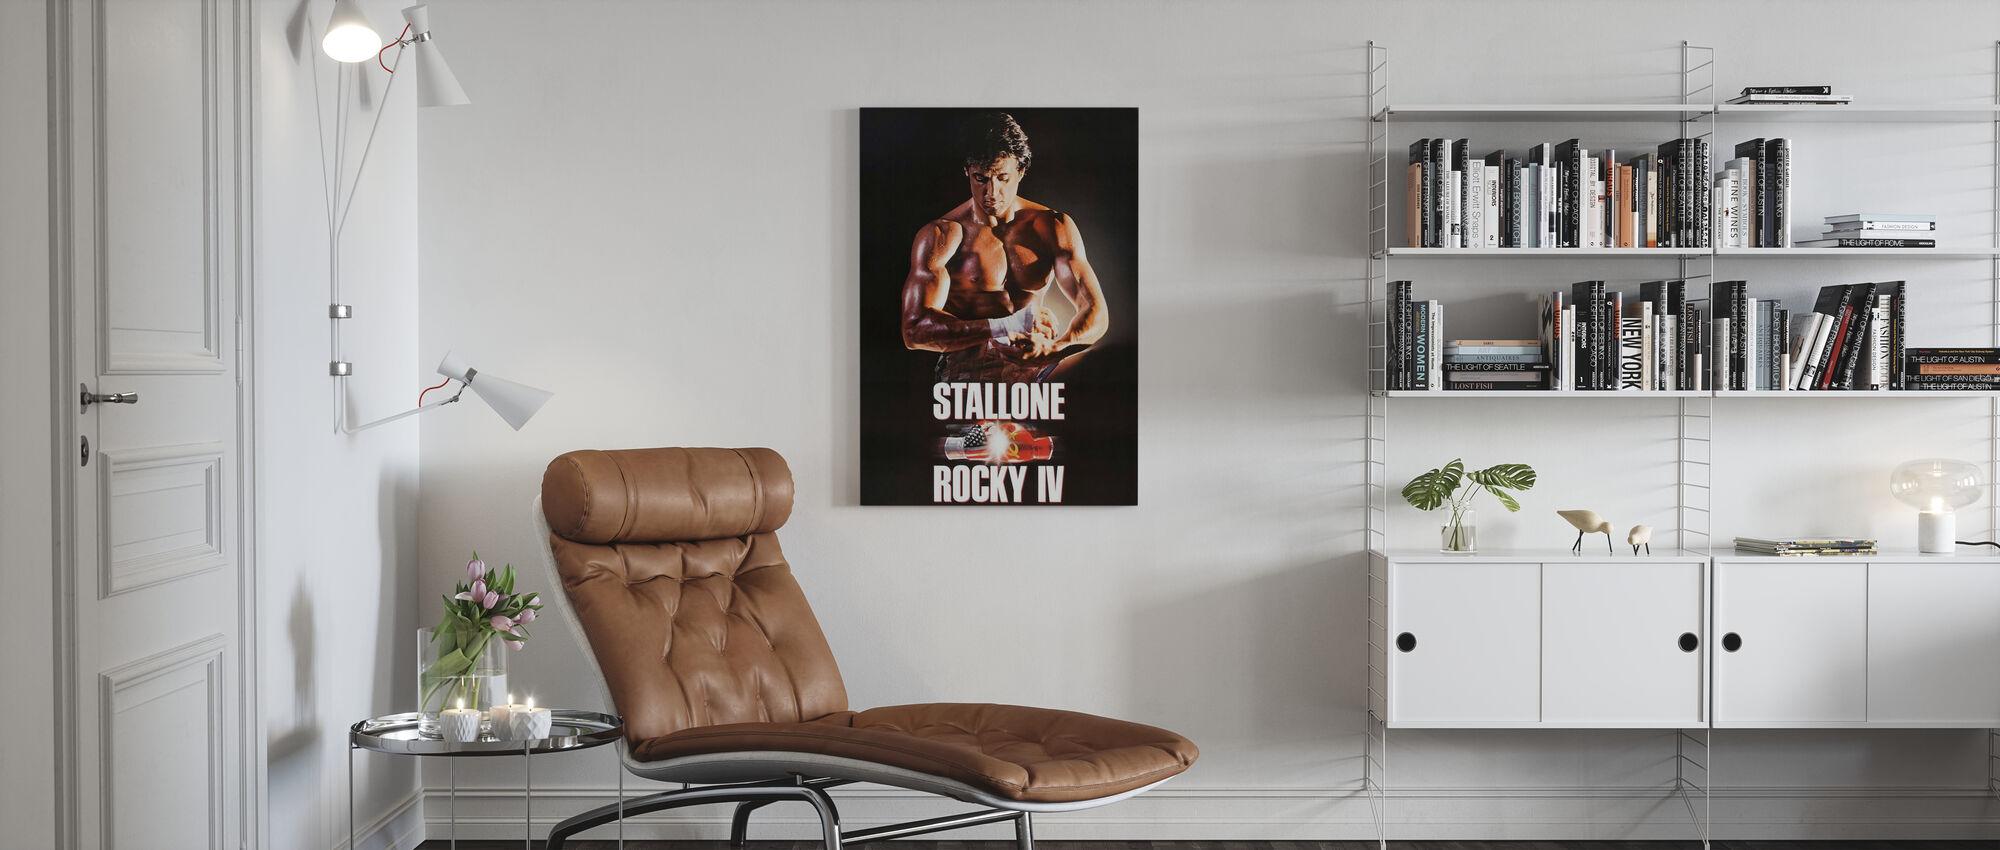 Sylvester Stallone in Rocky IV - Leinwandbild - Wohnzimmer